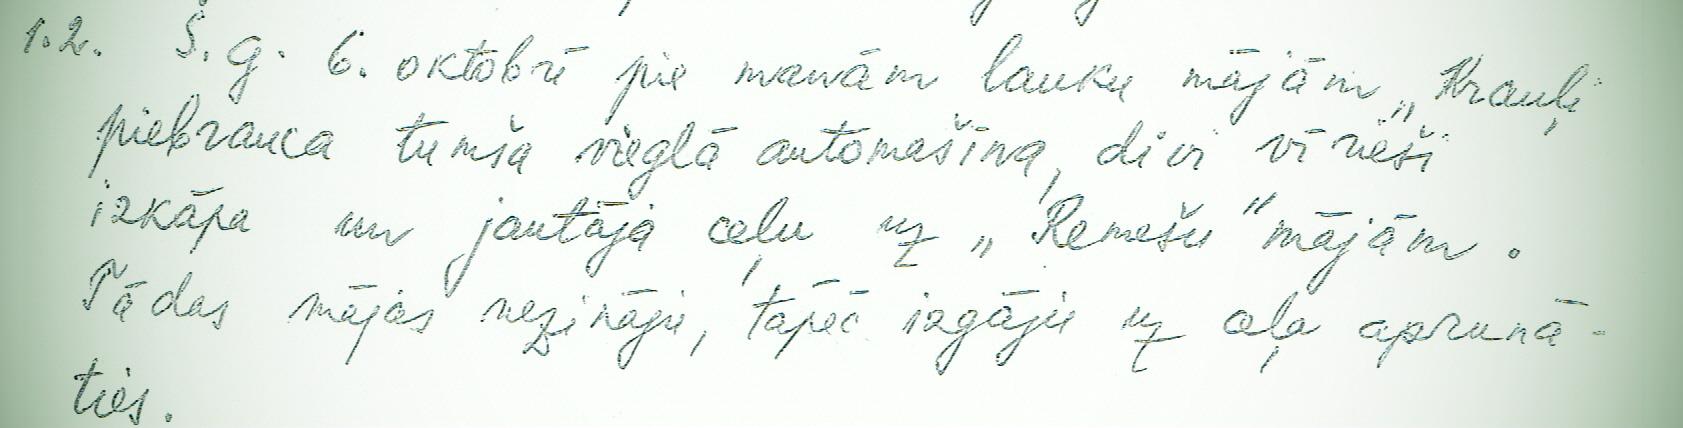 Indulis Ronis, Linards Grantiņš, LRTT, Latvija